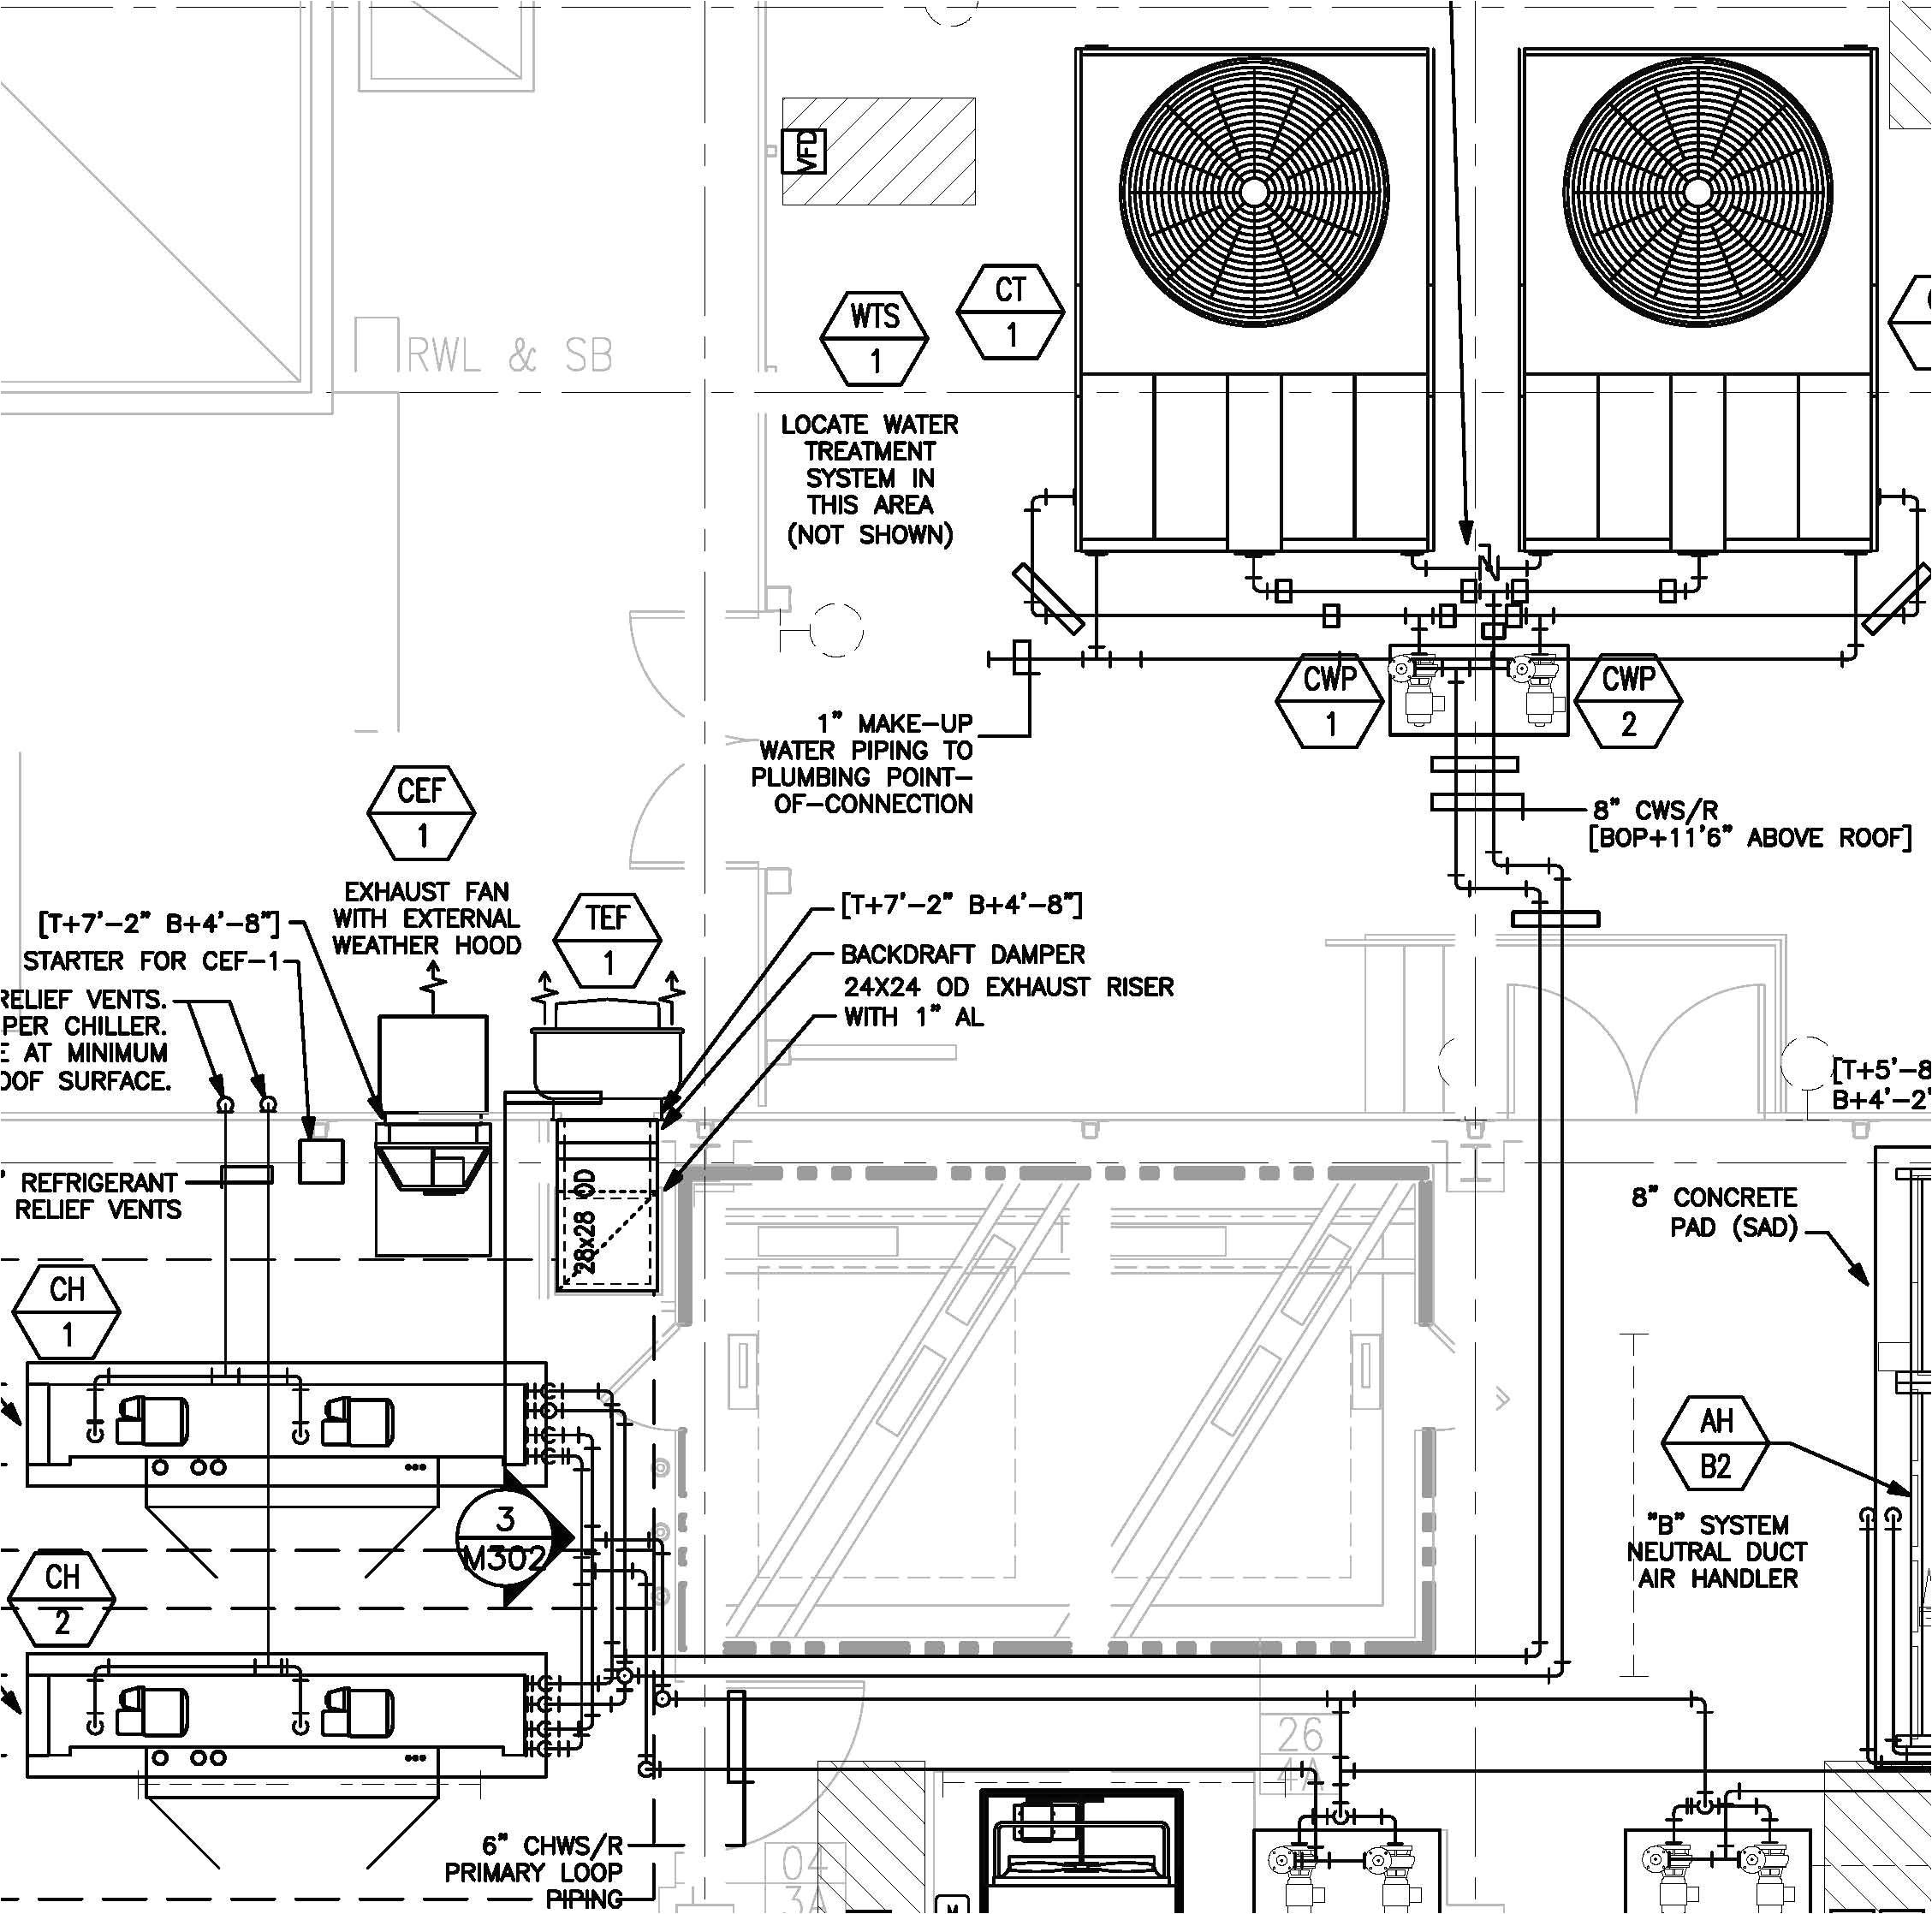 hvac transformer wiring diagram hvac transformer wiring diagram best ac transformer wiring diagram new air